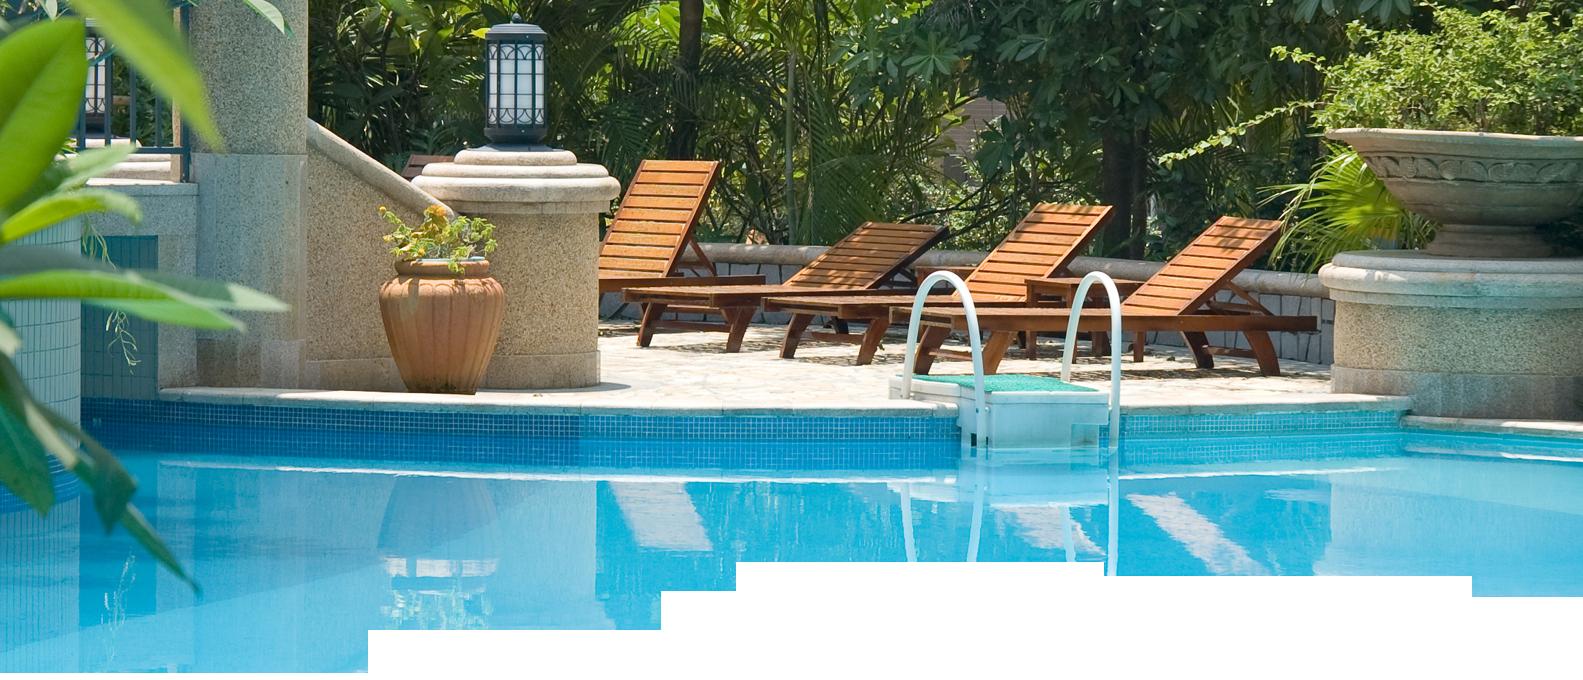 Construction de piscine en gironde m puntous for Marchand de piscine